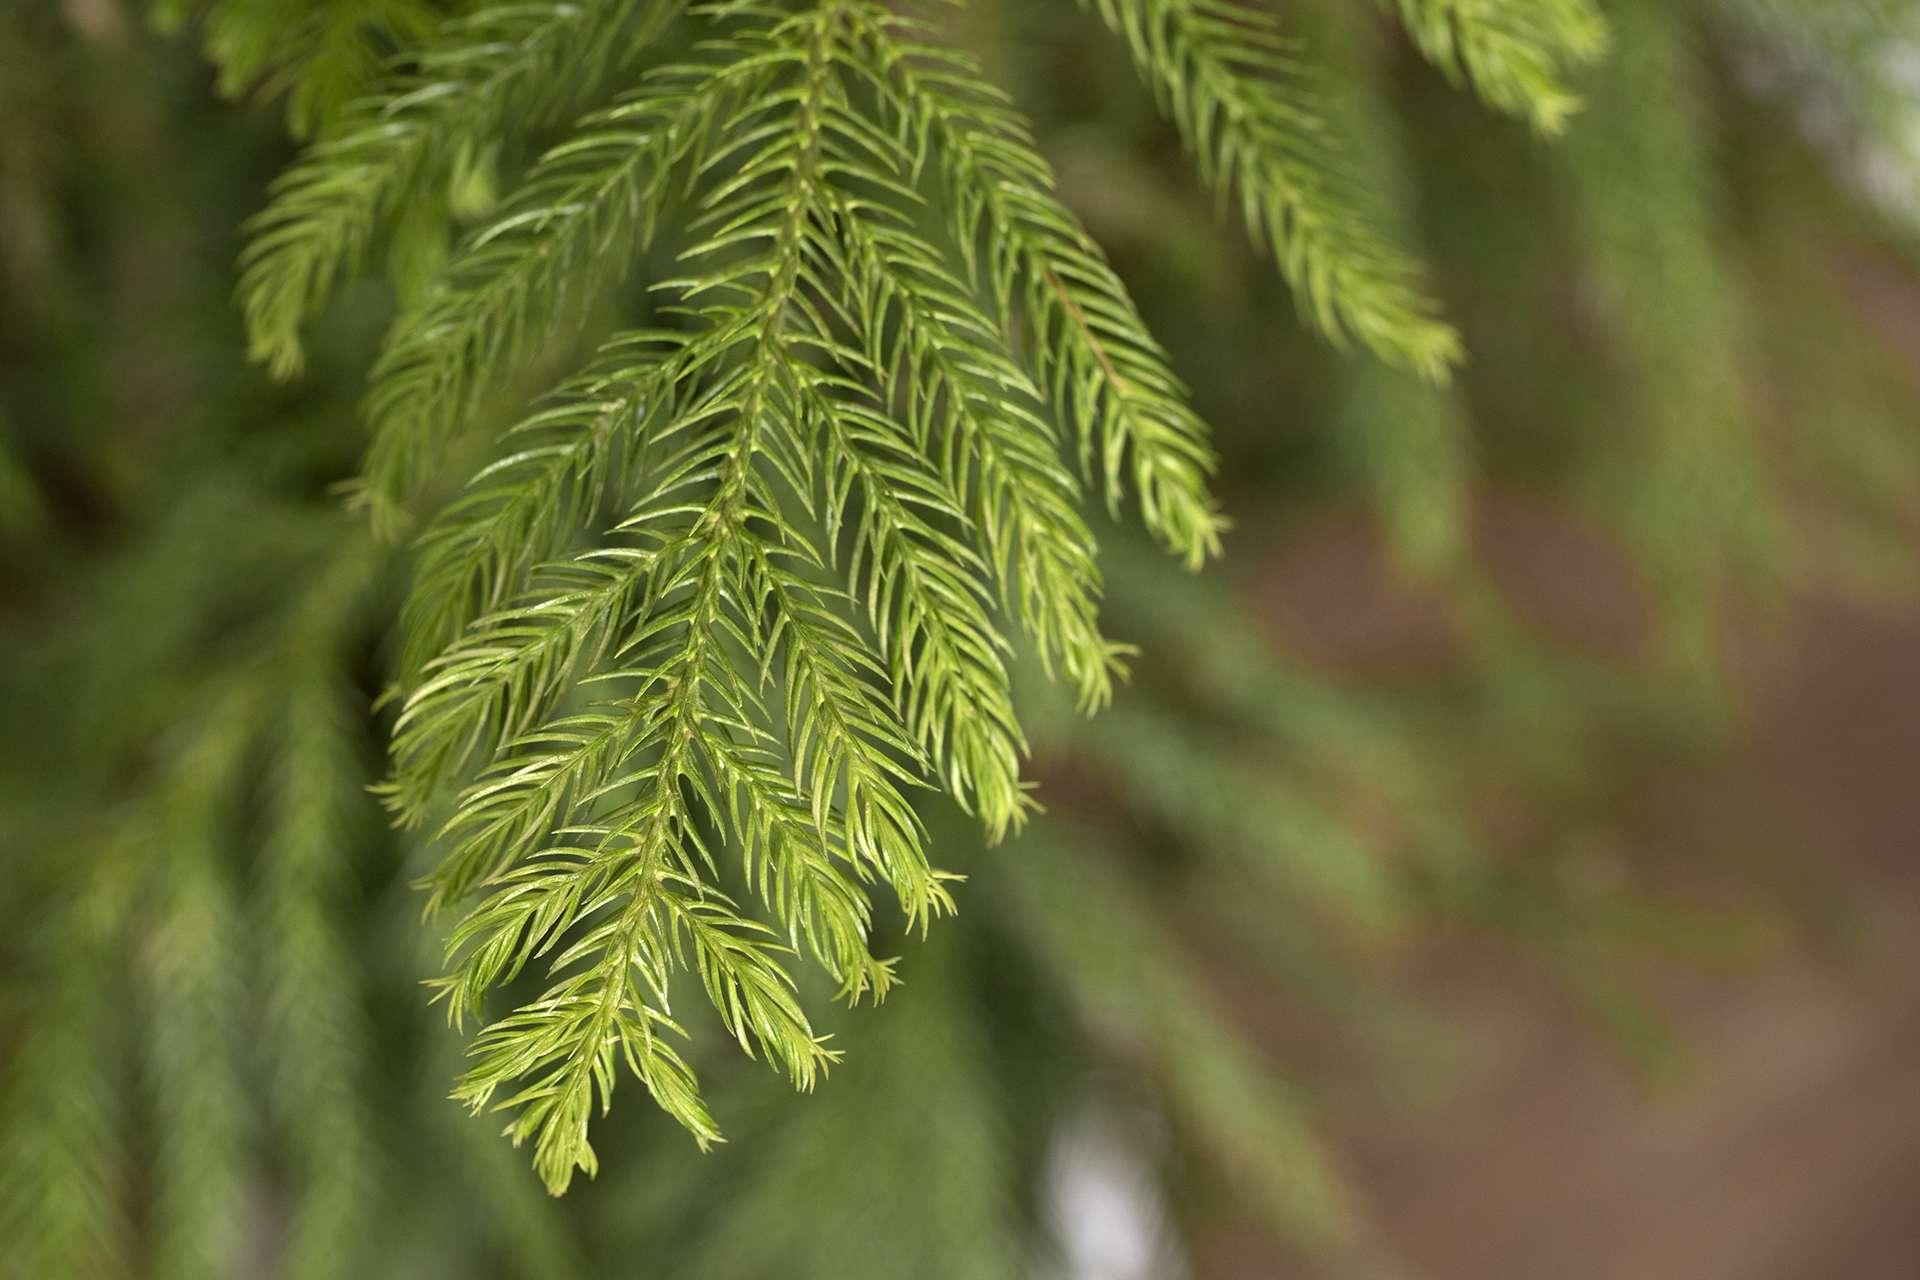 closeup of a Norfolk Island Pine